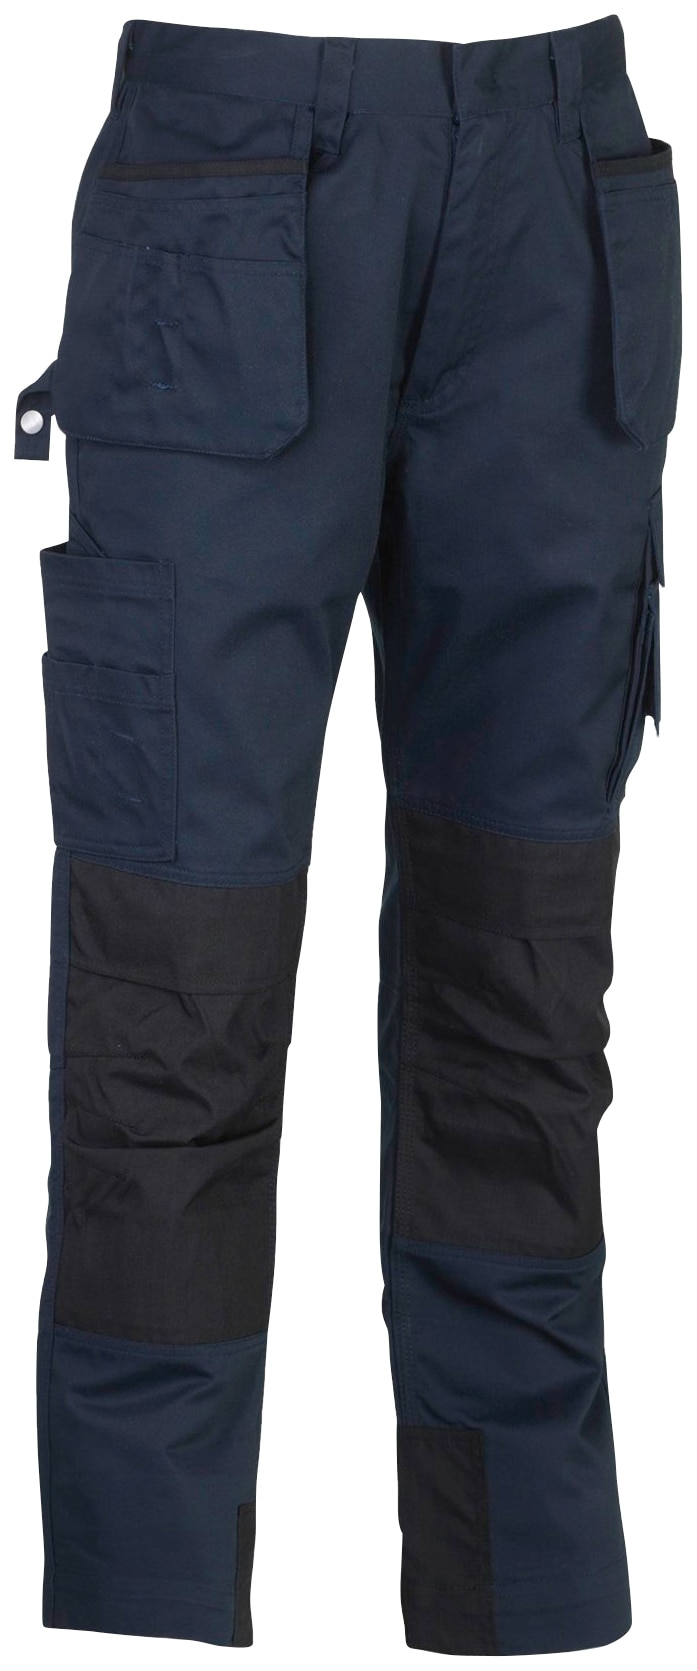 Herock Arbeitshose NATO HOSE SHORTLEG blau Herren Arbeitshosen Arbeits- Berufsbekleidung